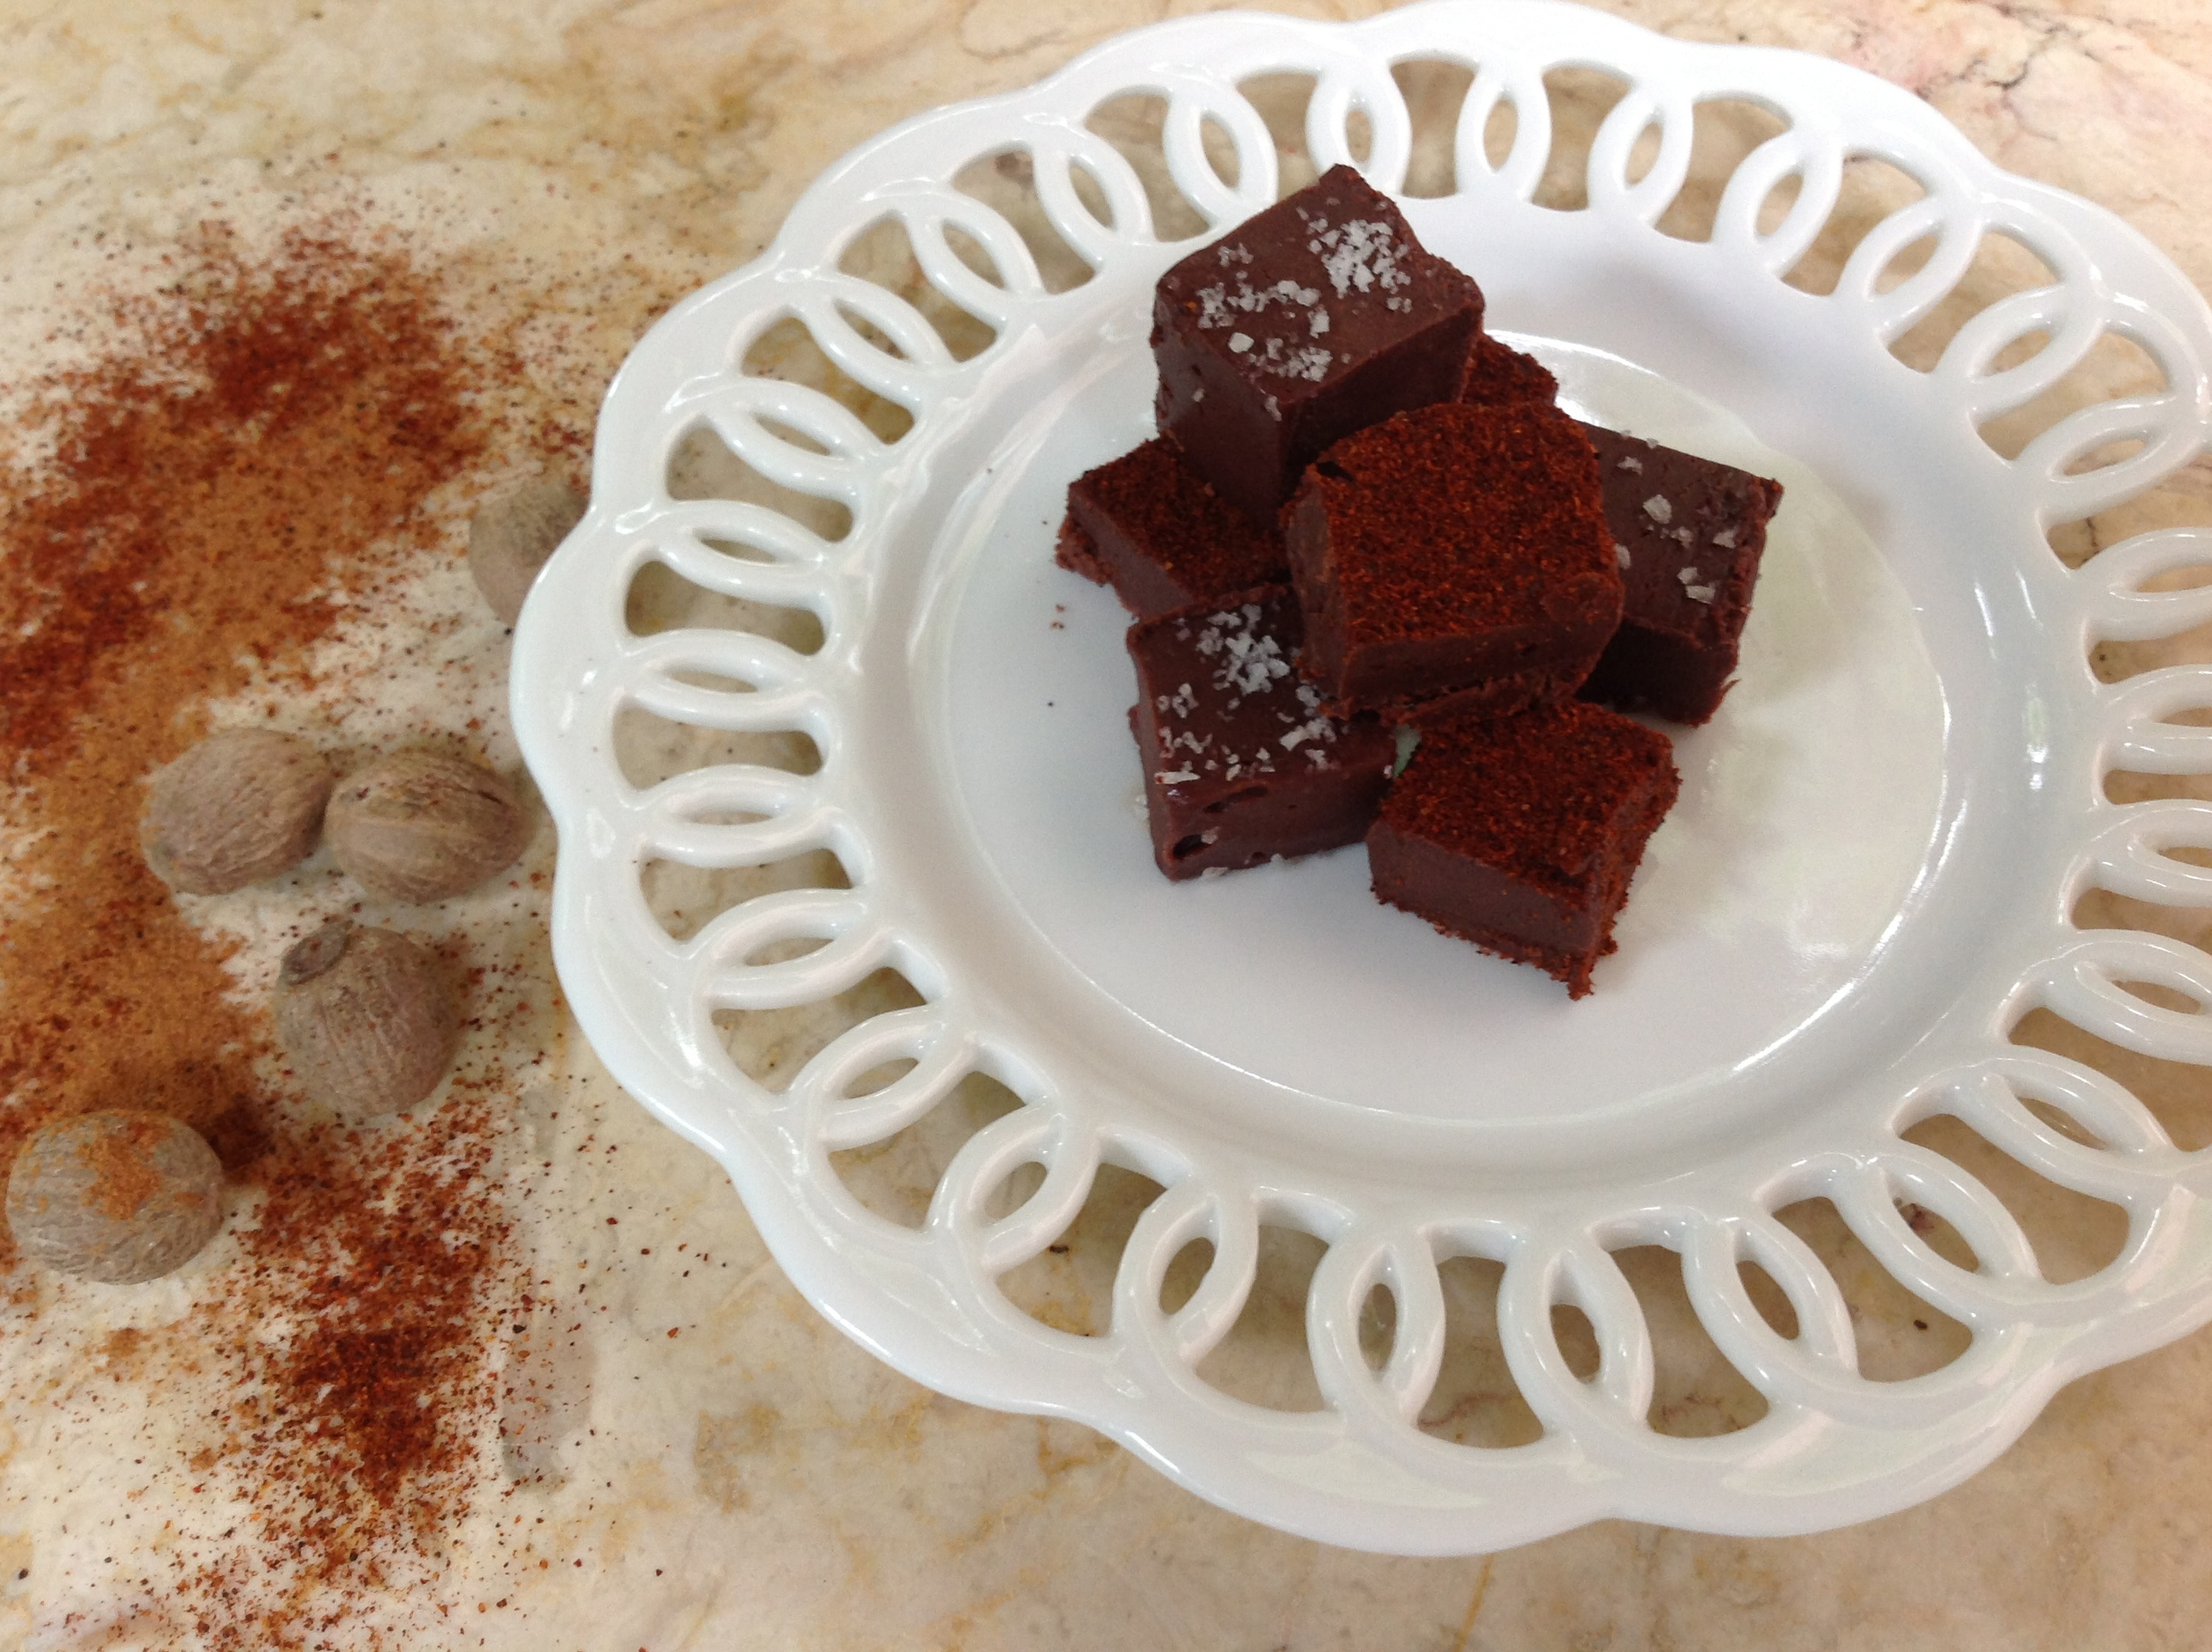 Chili Chocolate Fudge.jpg